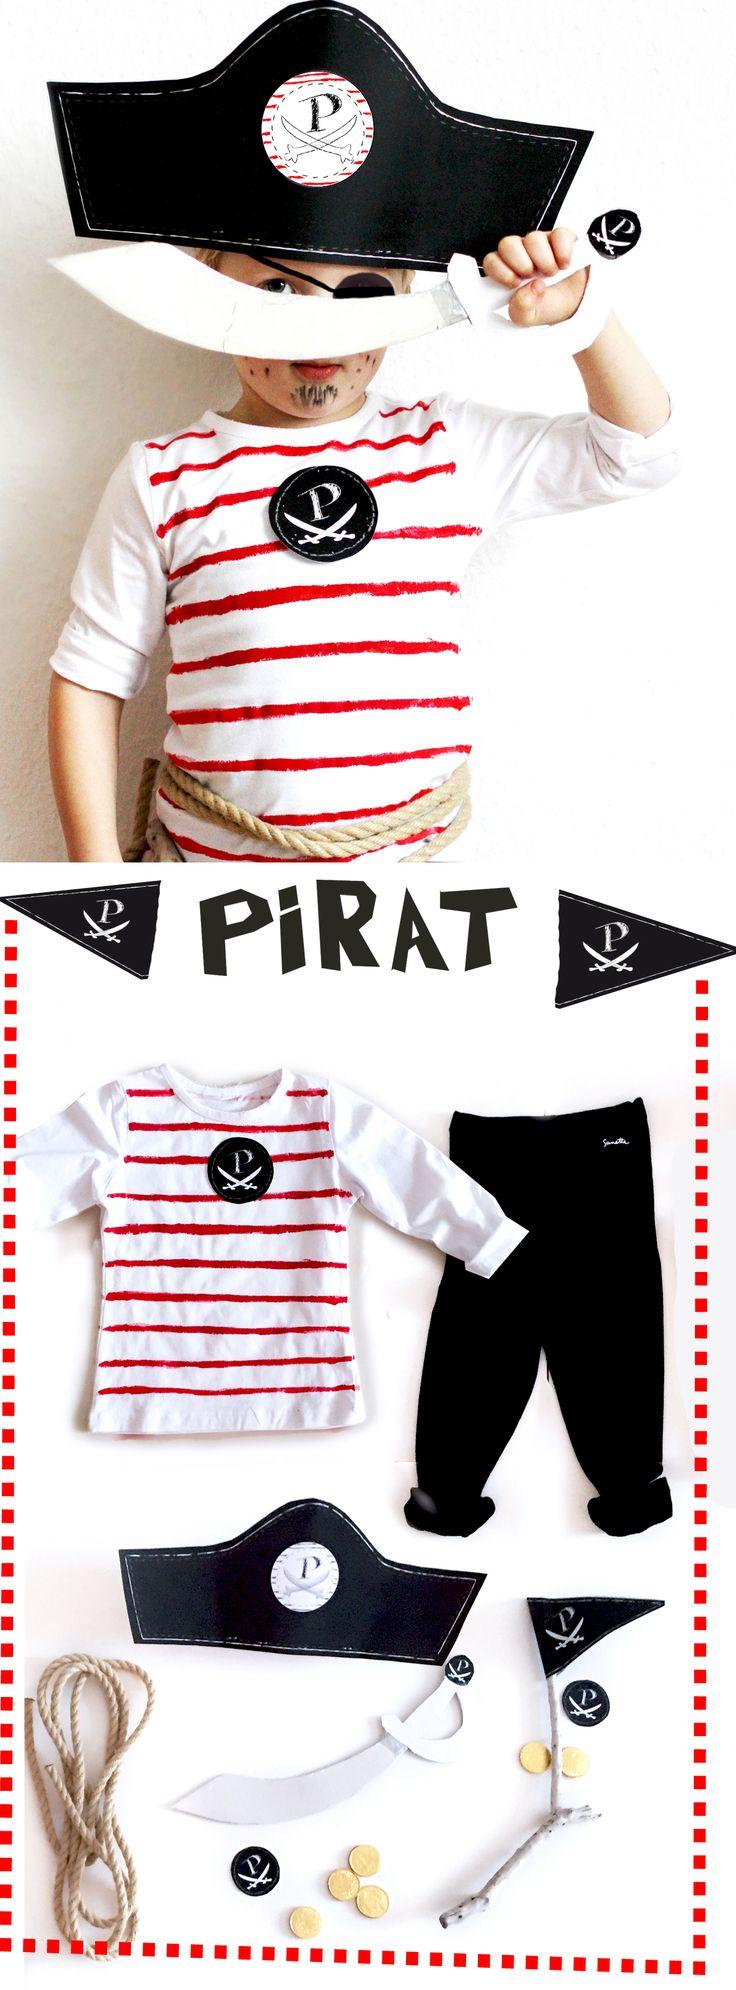 25 best ideas about piraten kost m on pinterest party. Black Bedroom Furniture Sets. Home Design Ideas